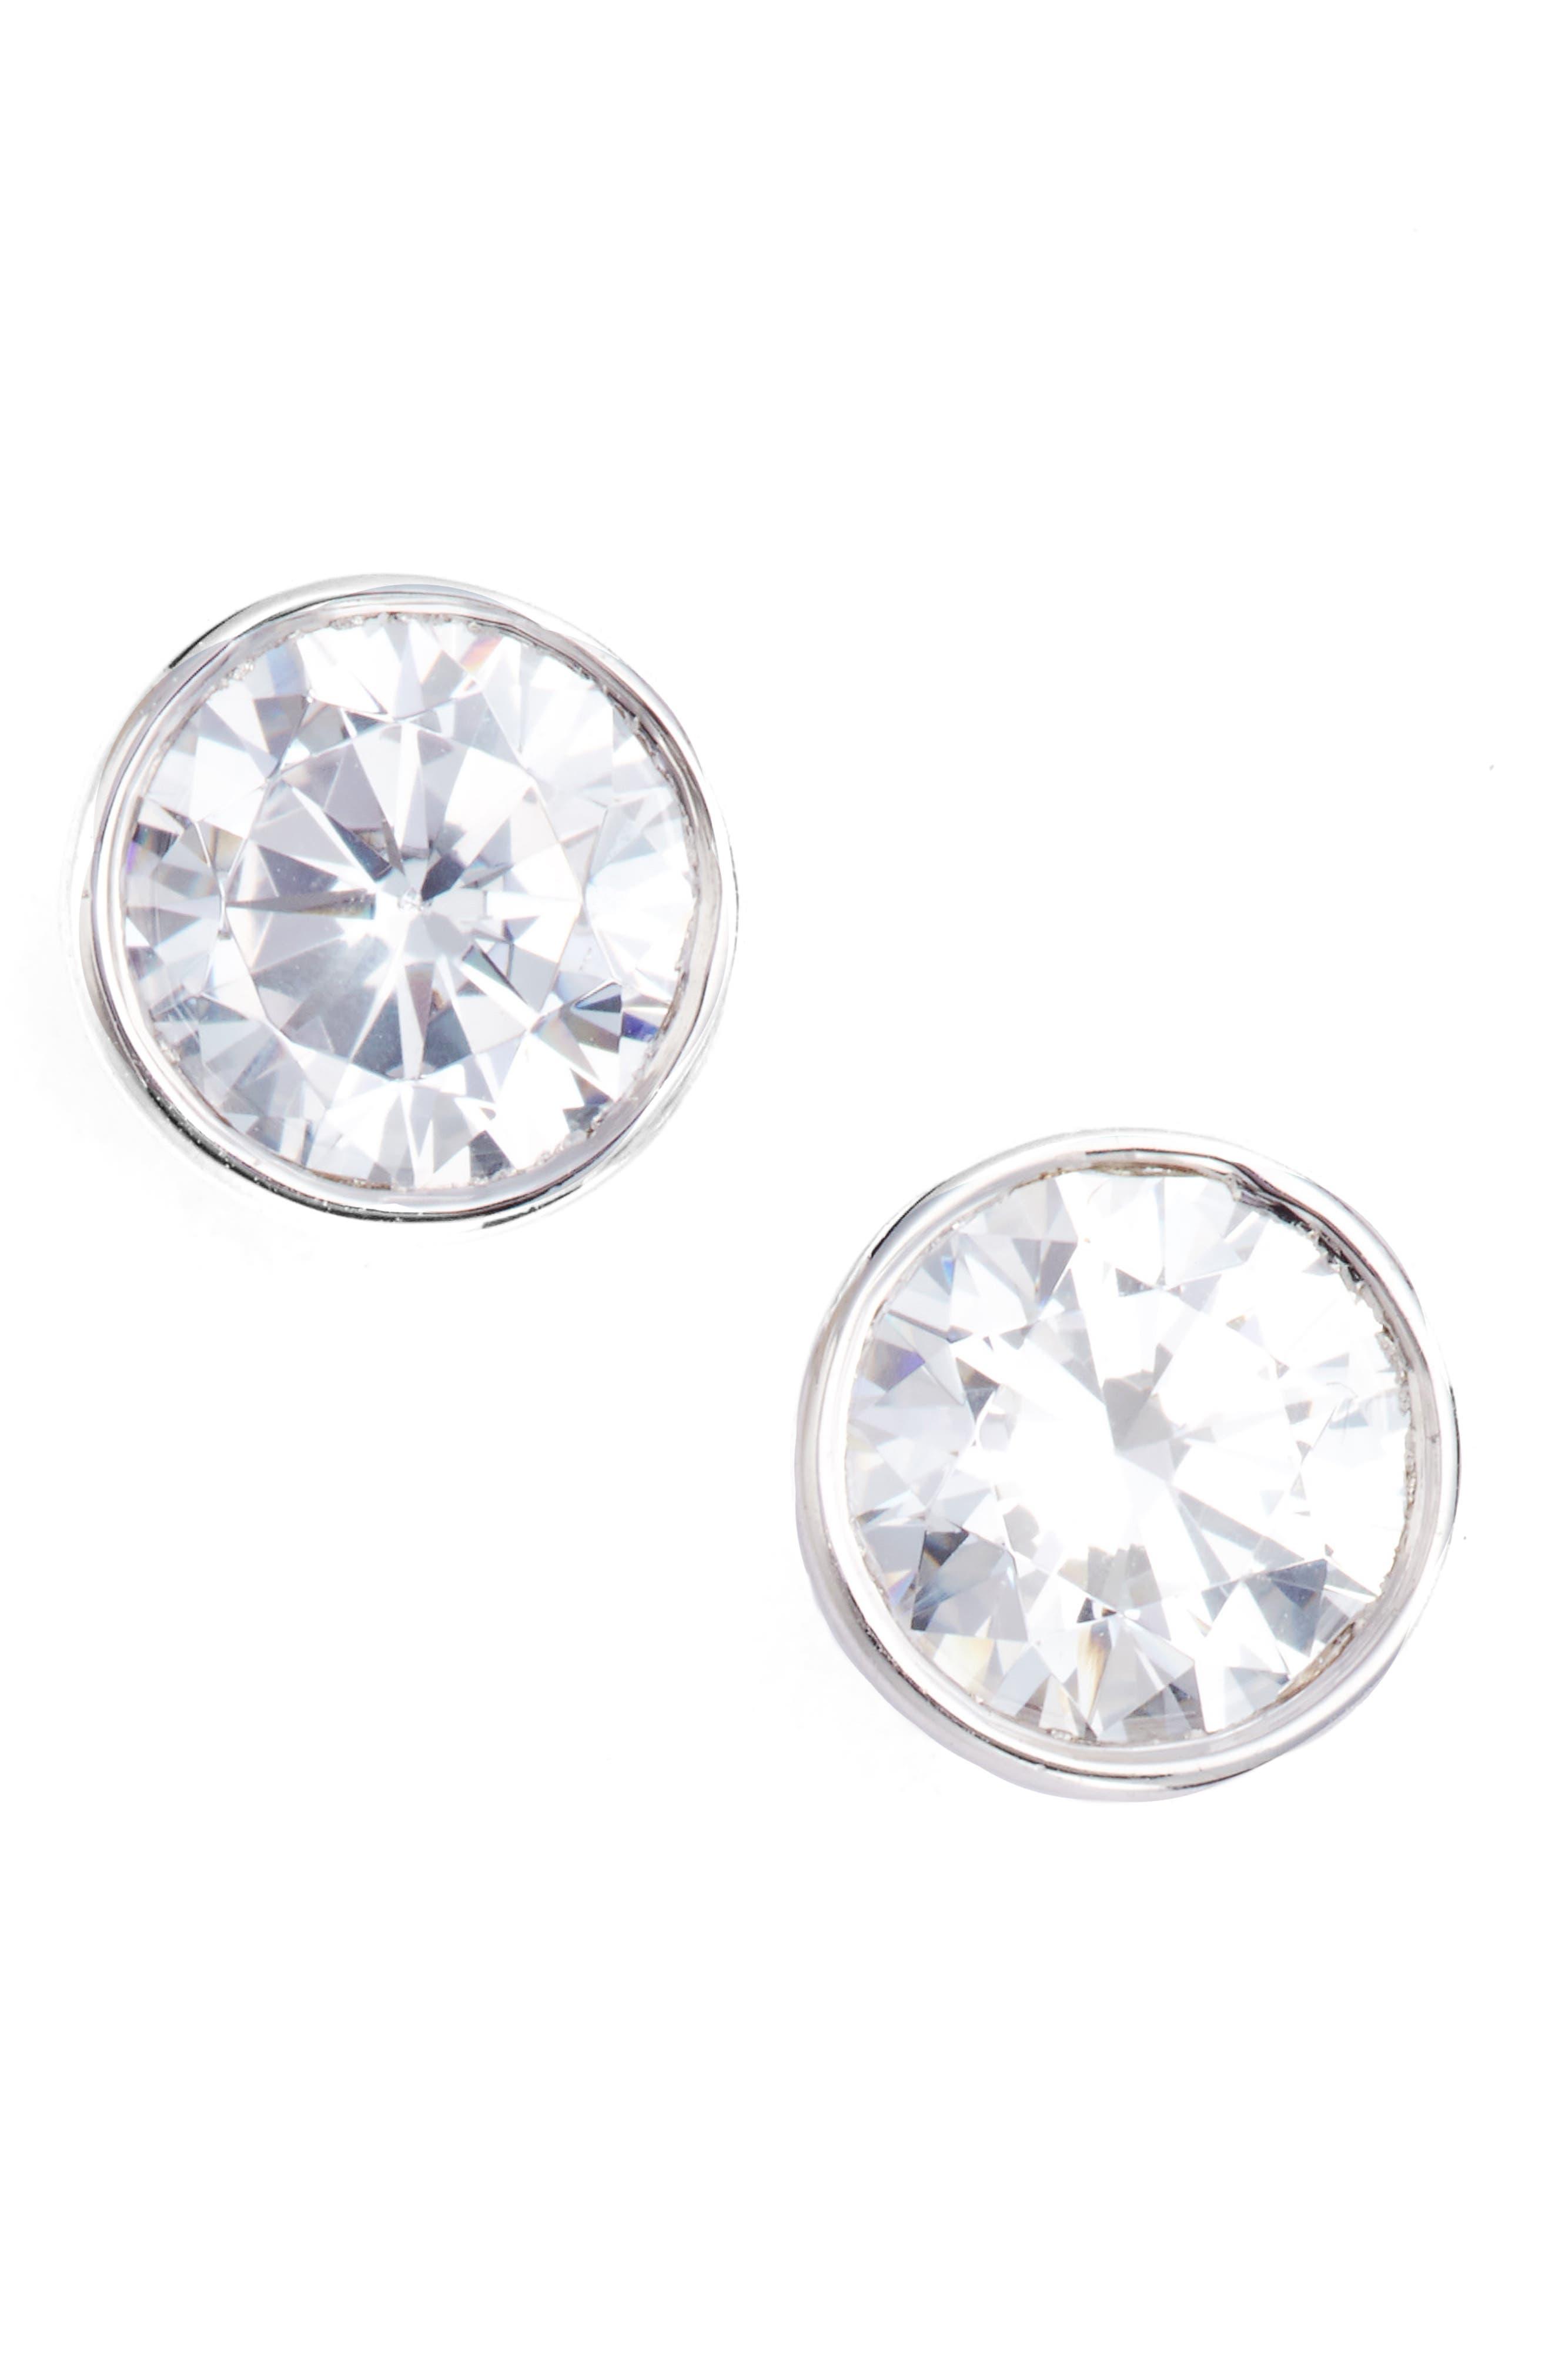 Cubic Zirconia Bezel Stud Earrings,                             Main thumbnail 1, color,                             Platinum